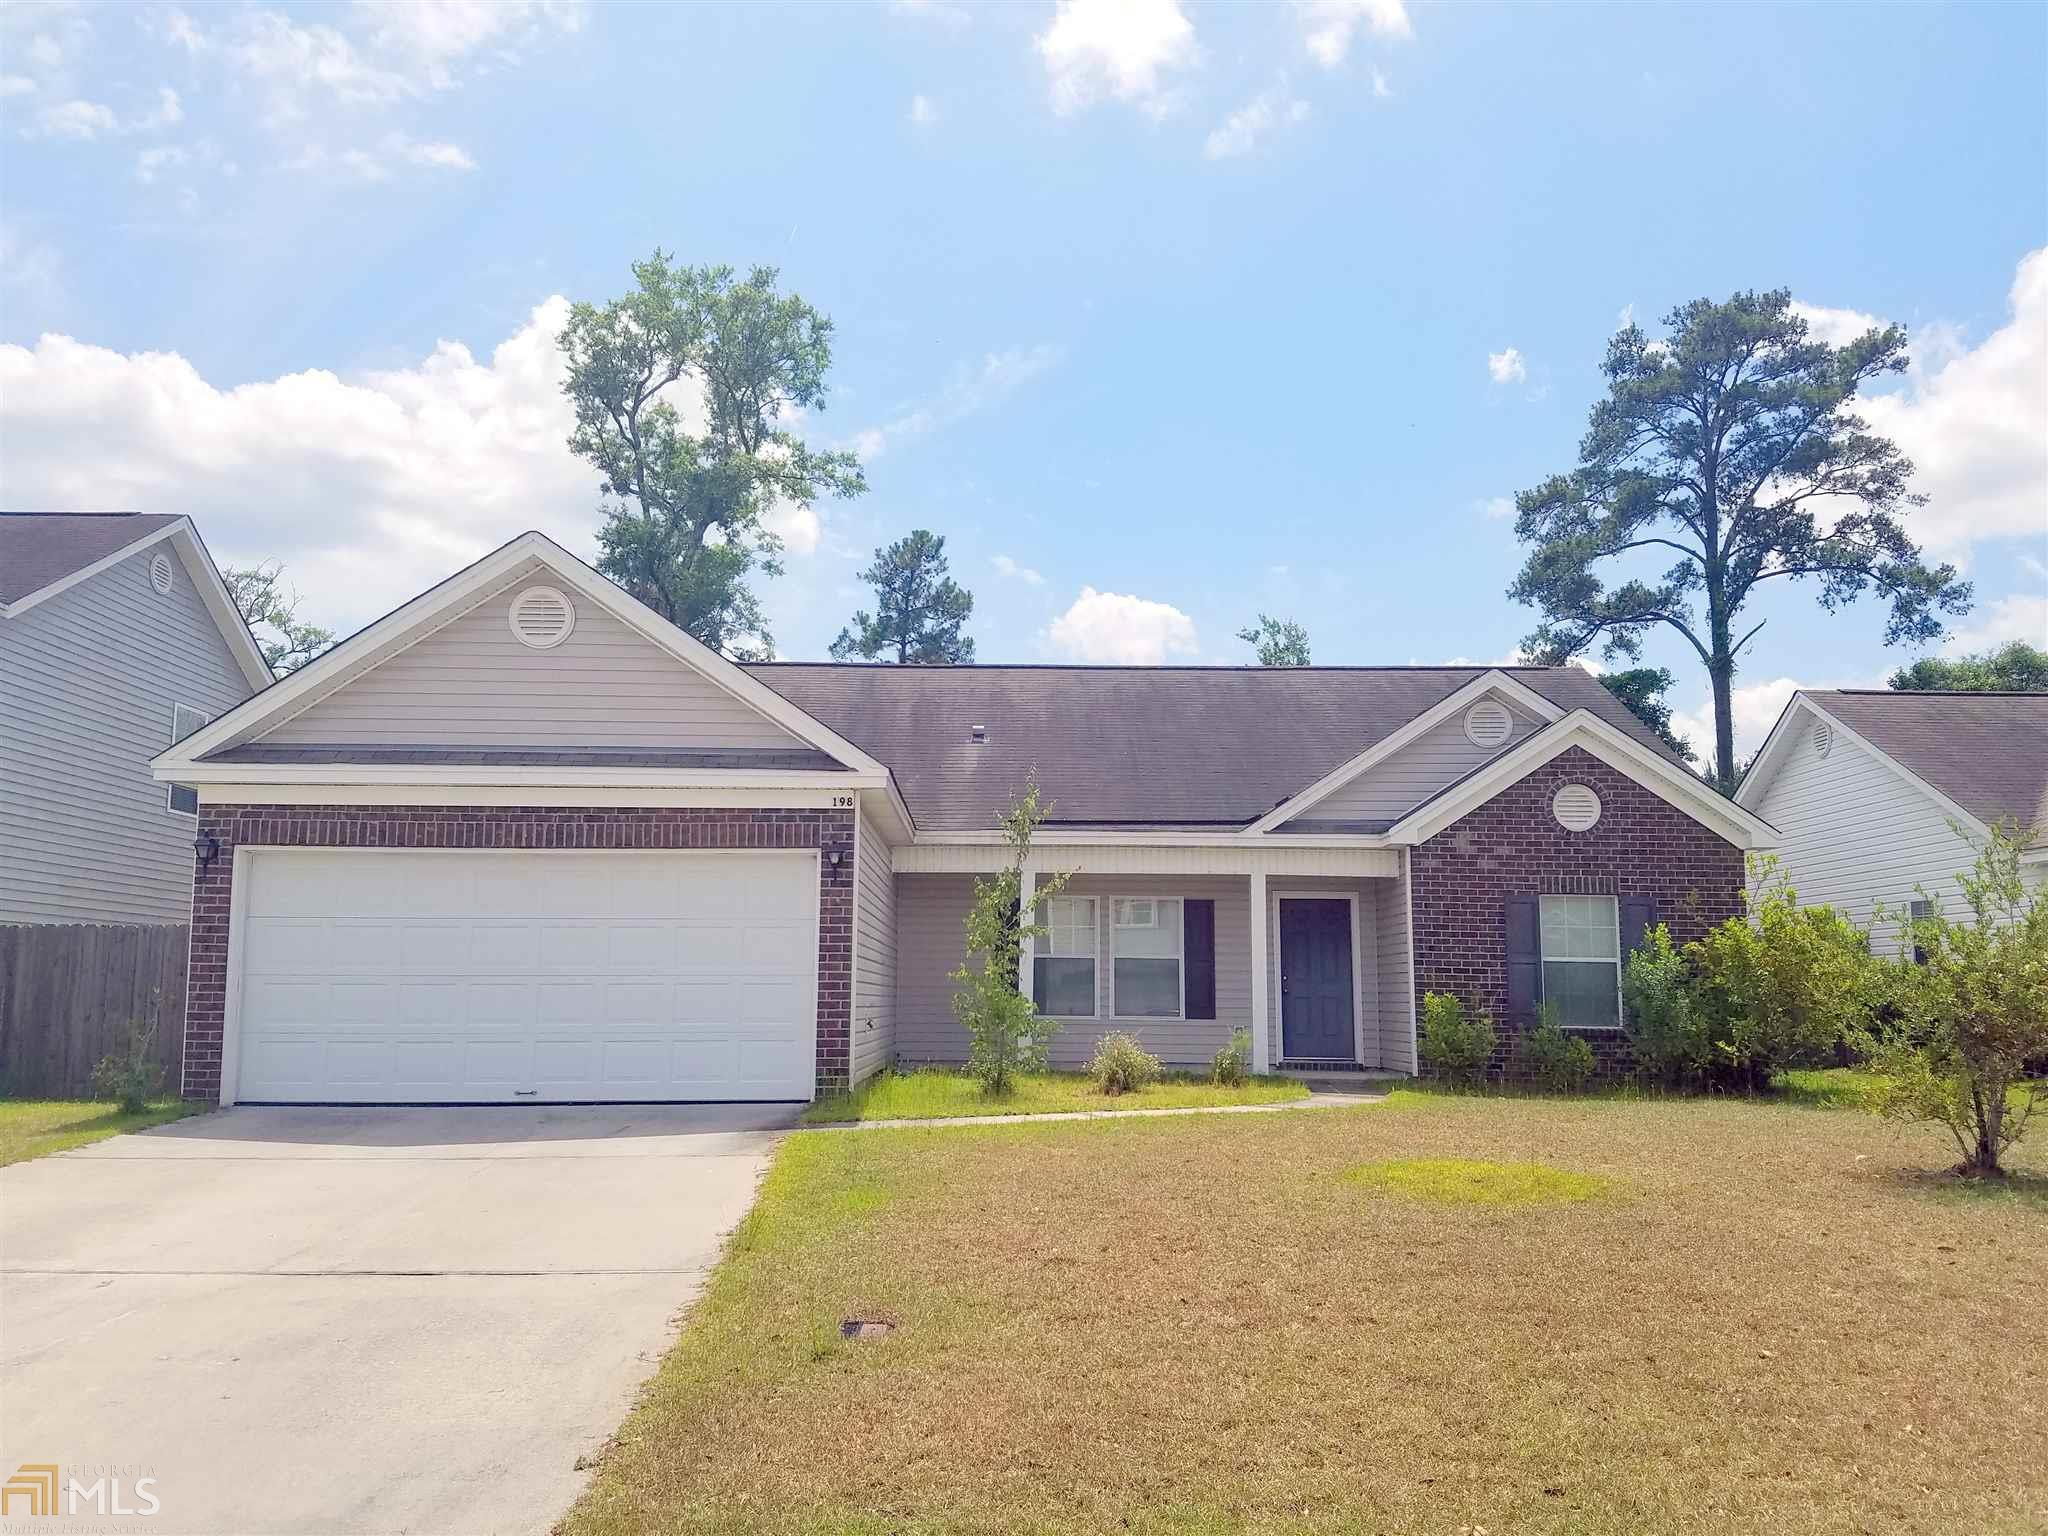 198 Cherry Laural Lane, Savannah, GA 31419